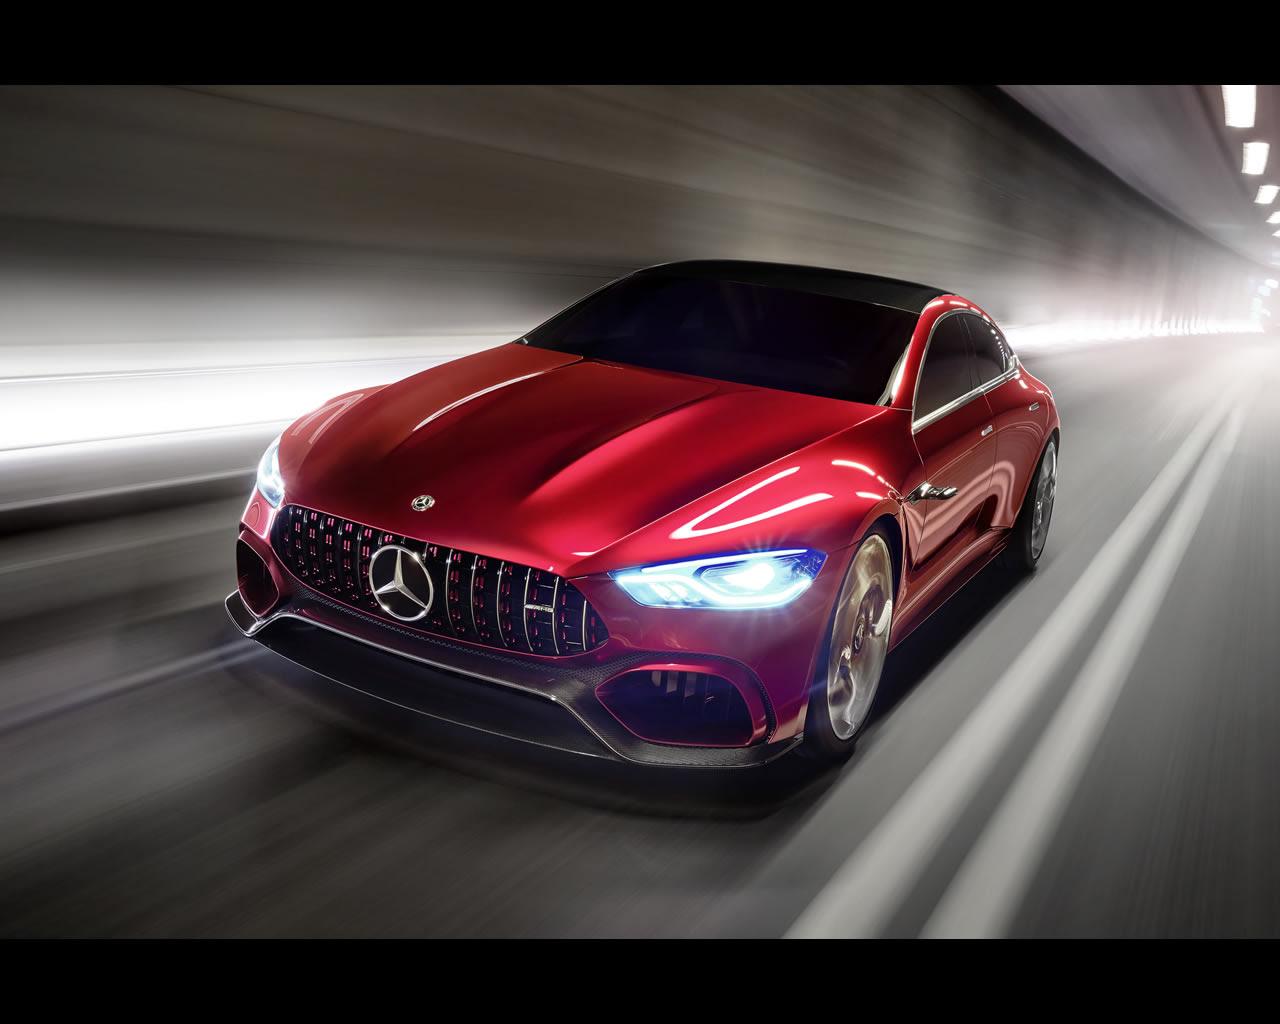 Mercedes-Benz AMG GT Hybrid Concept 2017